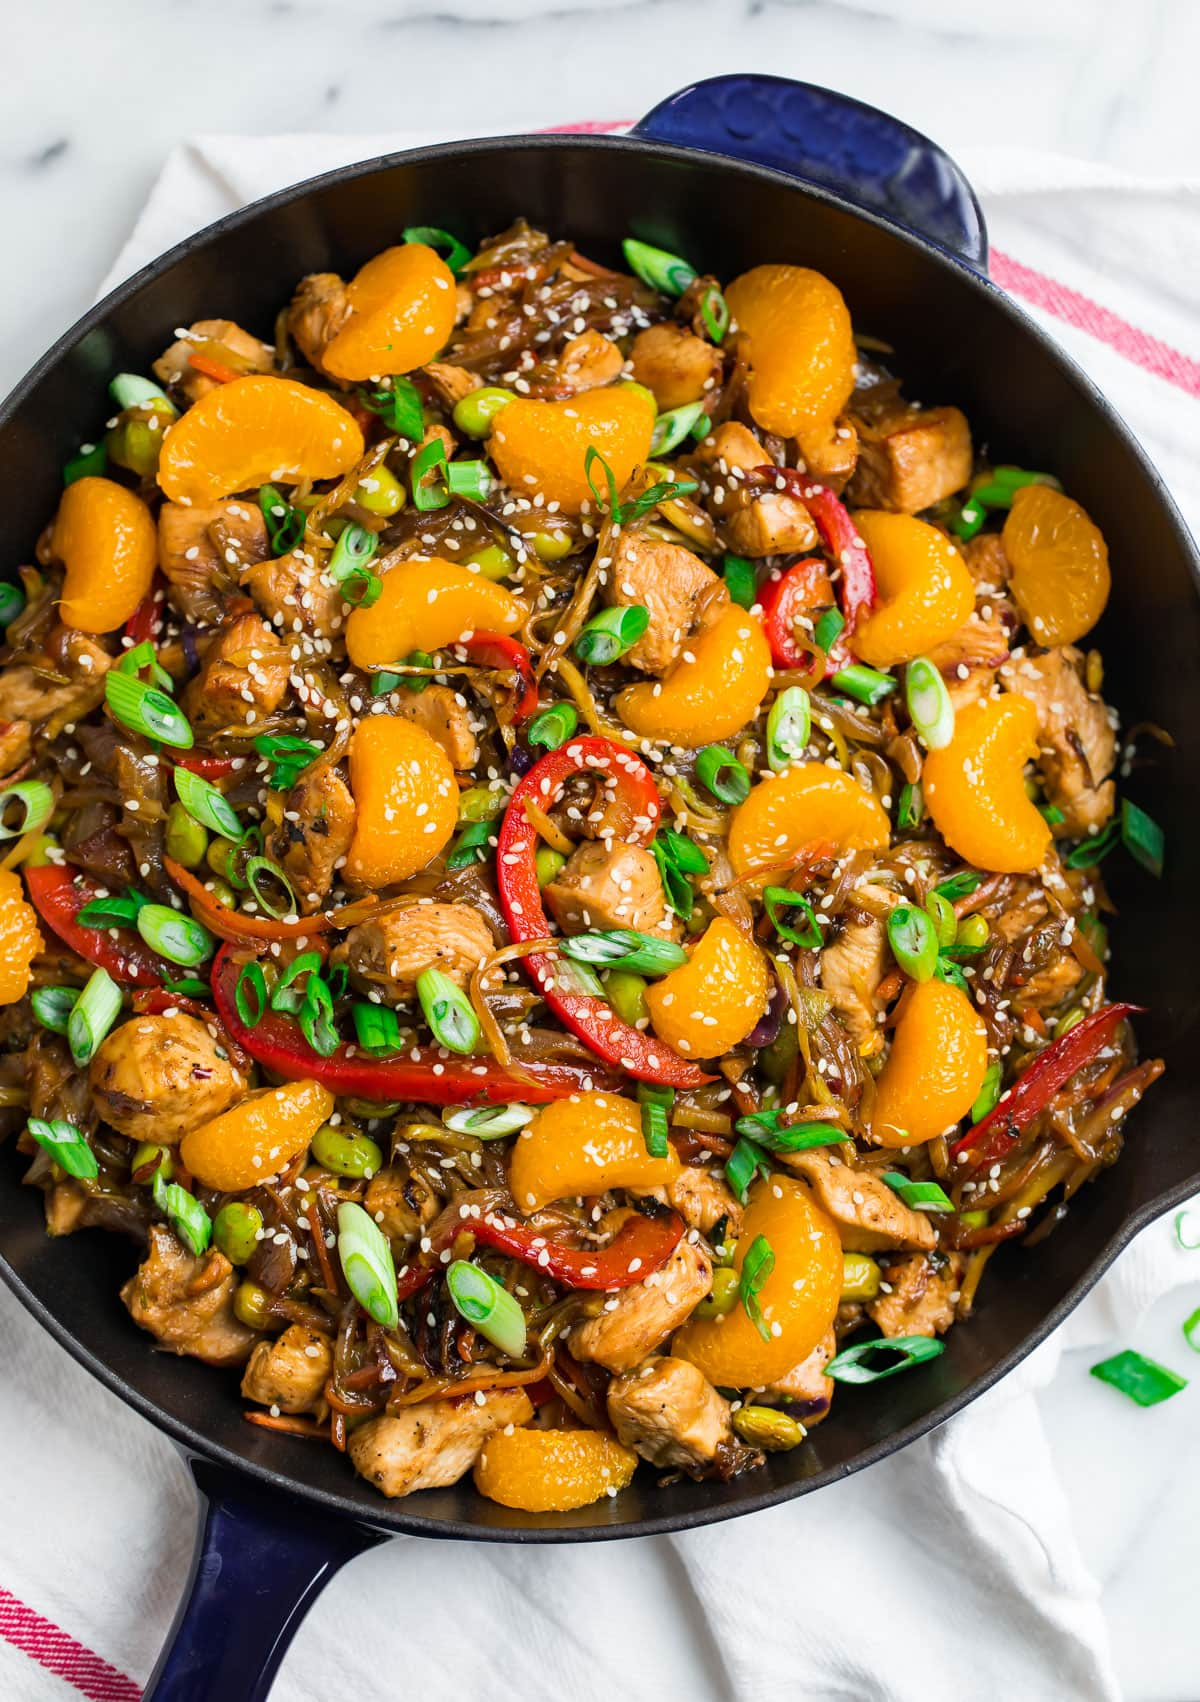 A healthy chicken stir fry with oranges